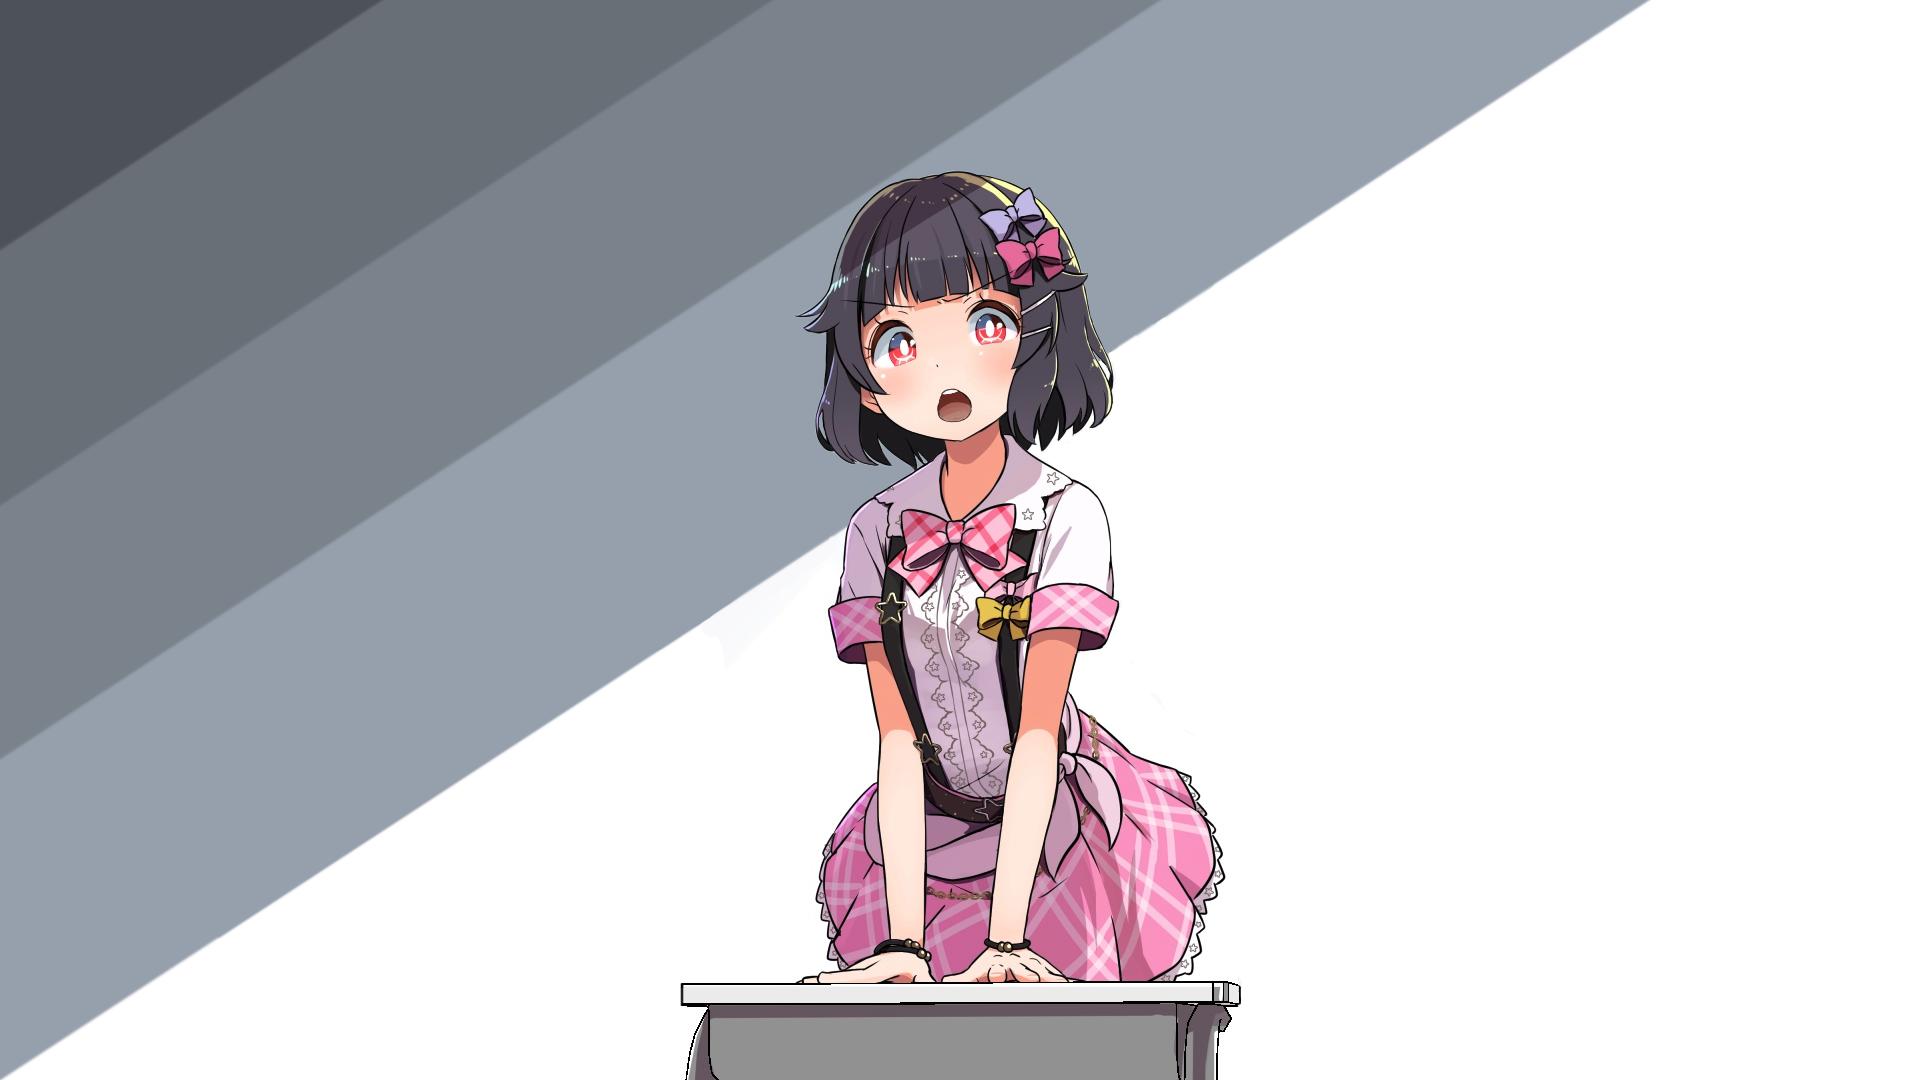 Sfondi Manga Anime Girls Kawaii Girl Rosa Sfondo Semplice